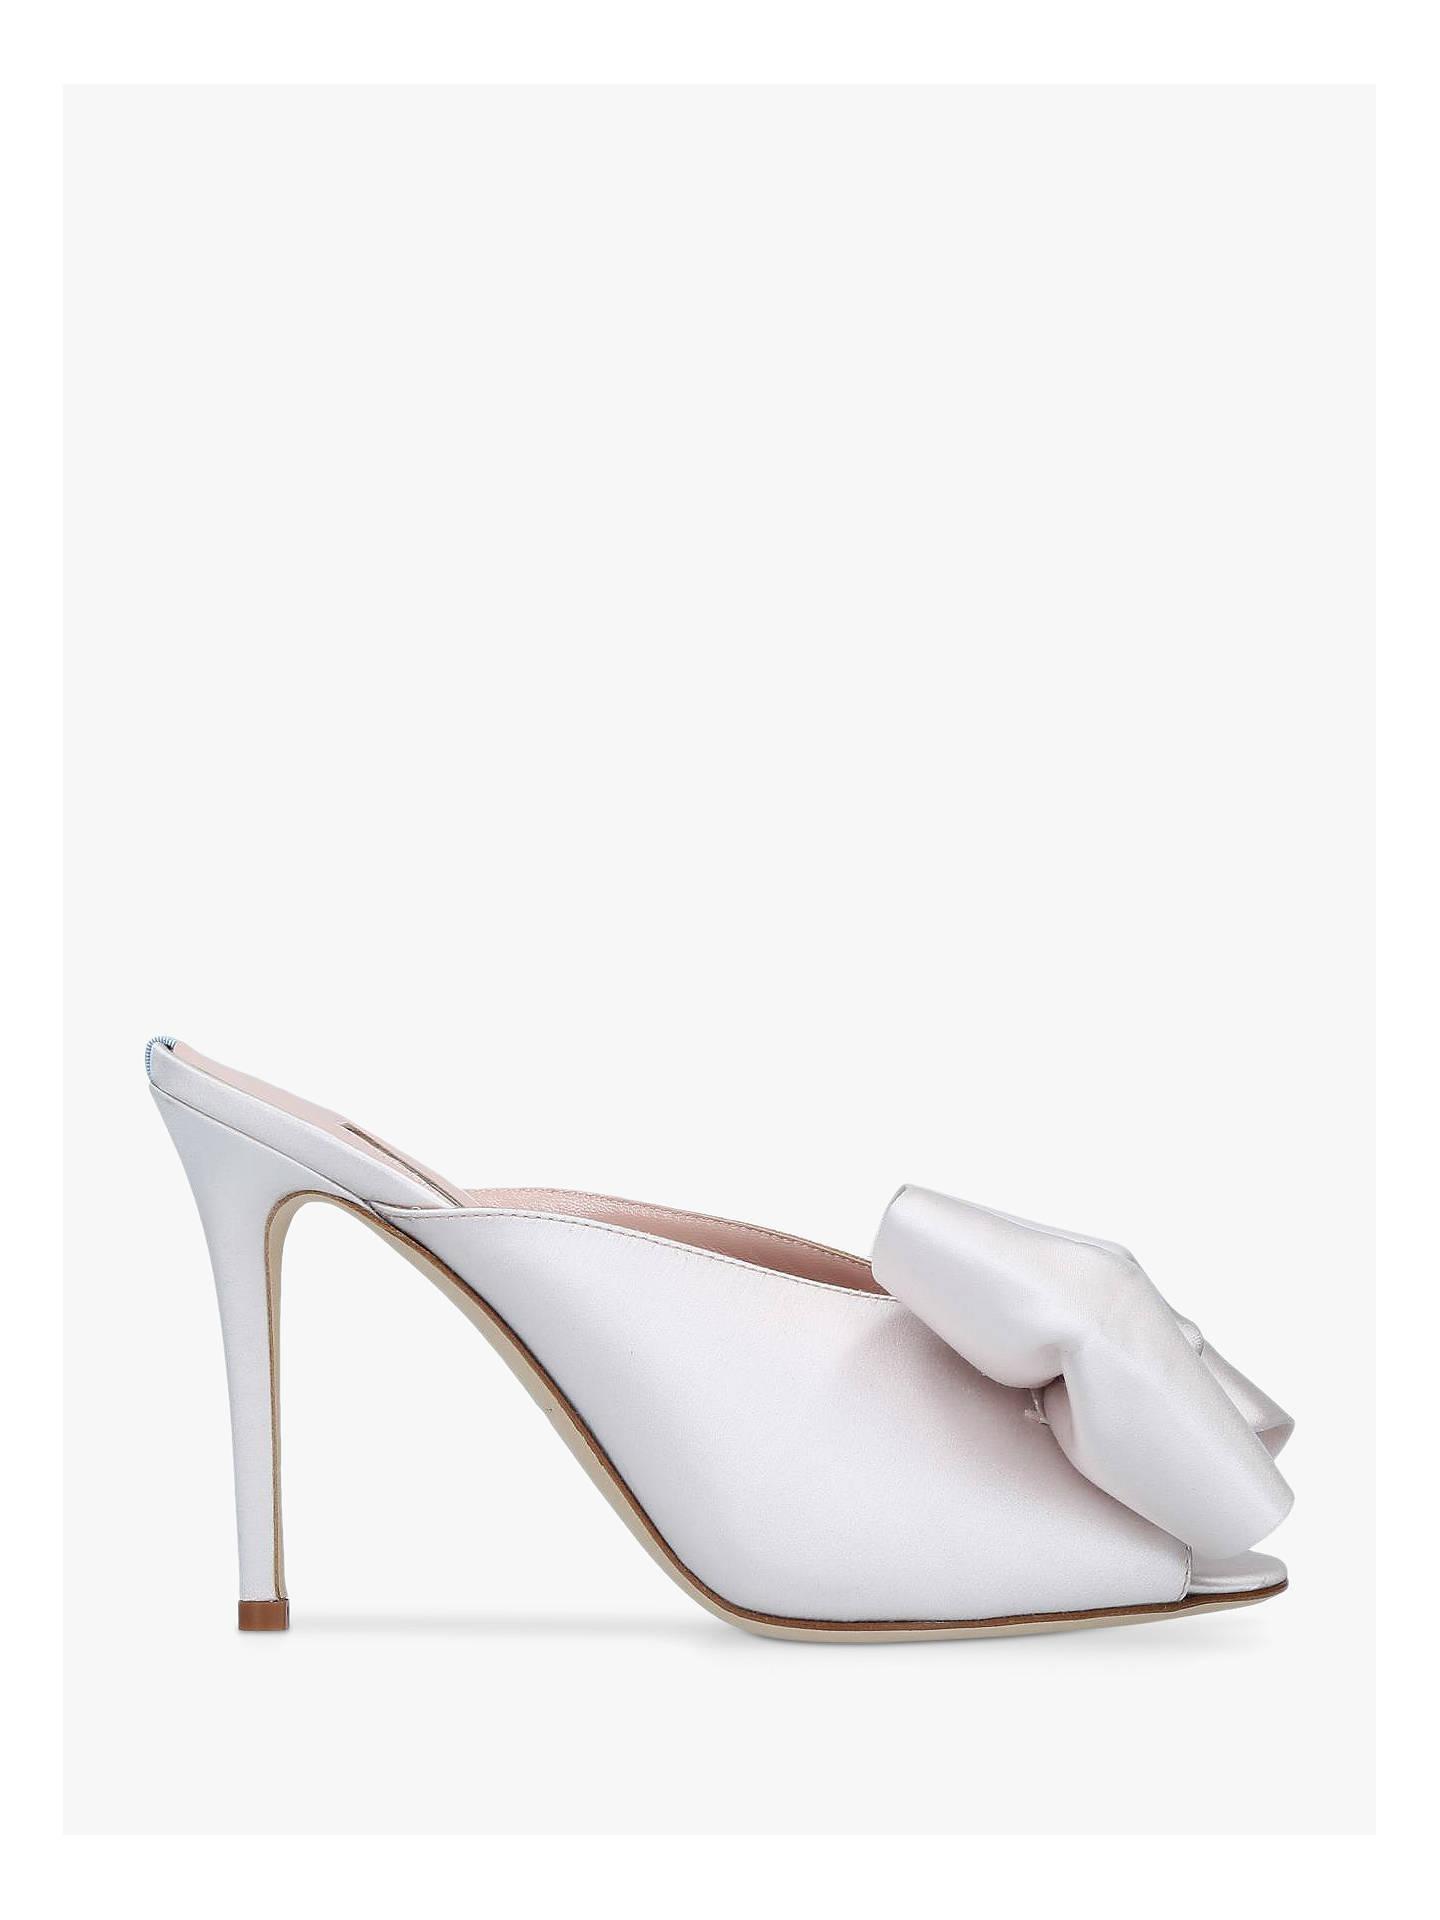 0a2390ddd078 Buy SJP by Sarah Jessica Parker Vesper Peep Toe Heeled Sandals